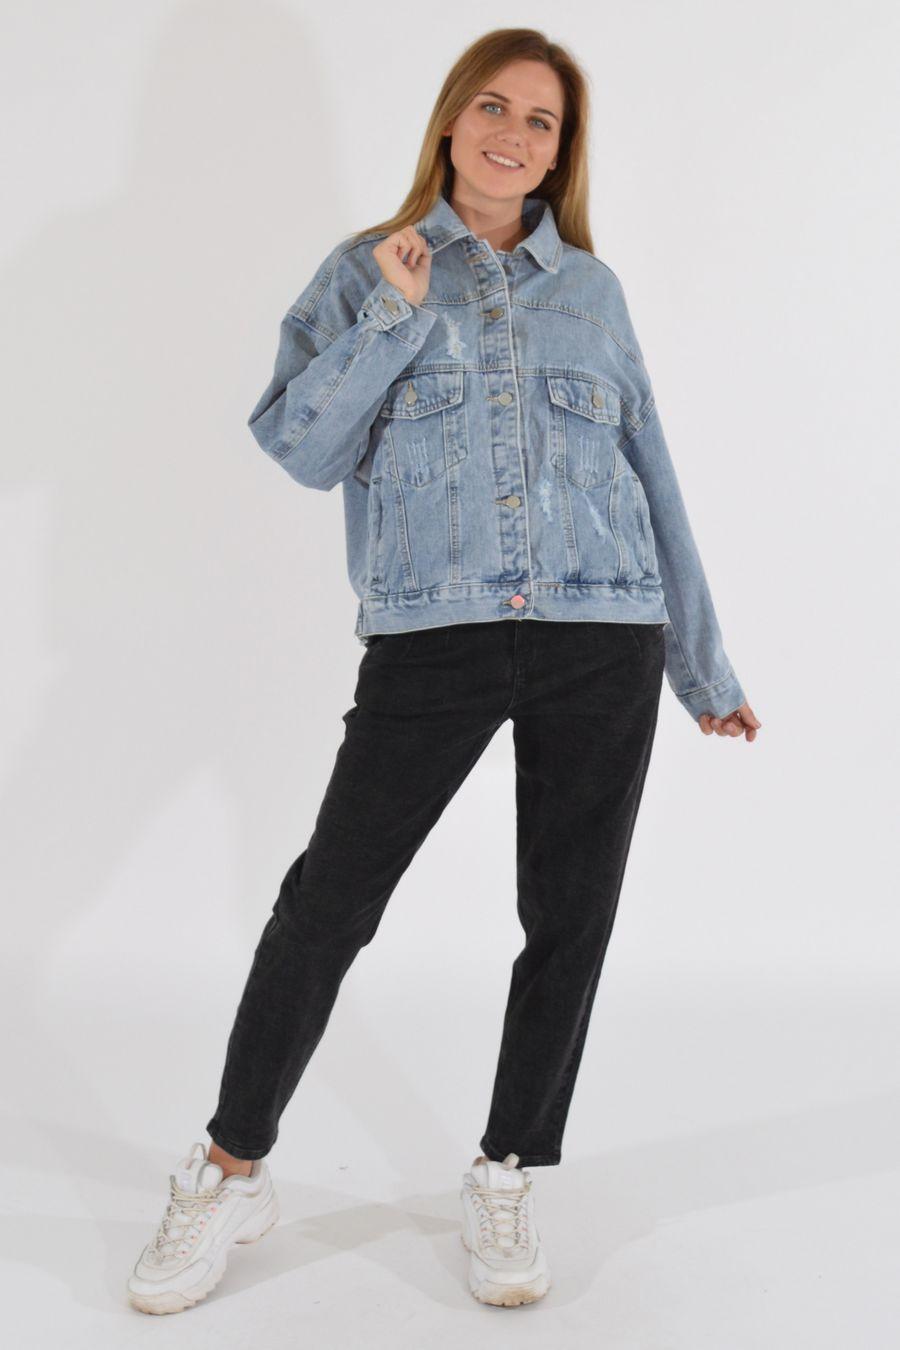 Жакет женский (джинсовка) LRZBS 2189 - фото 1